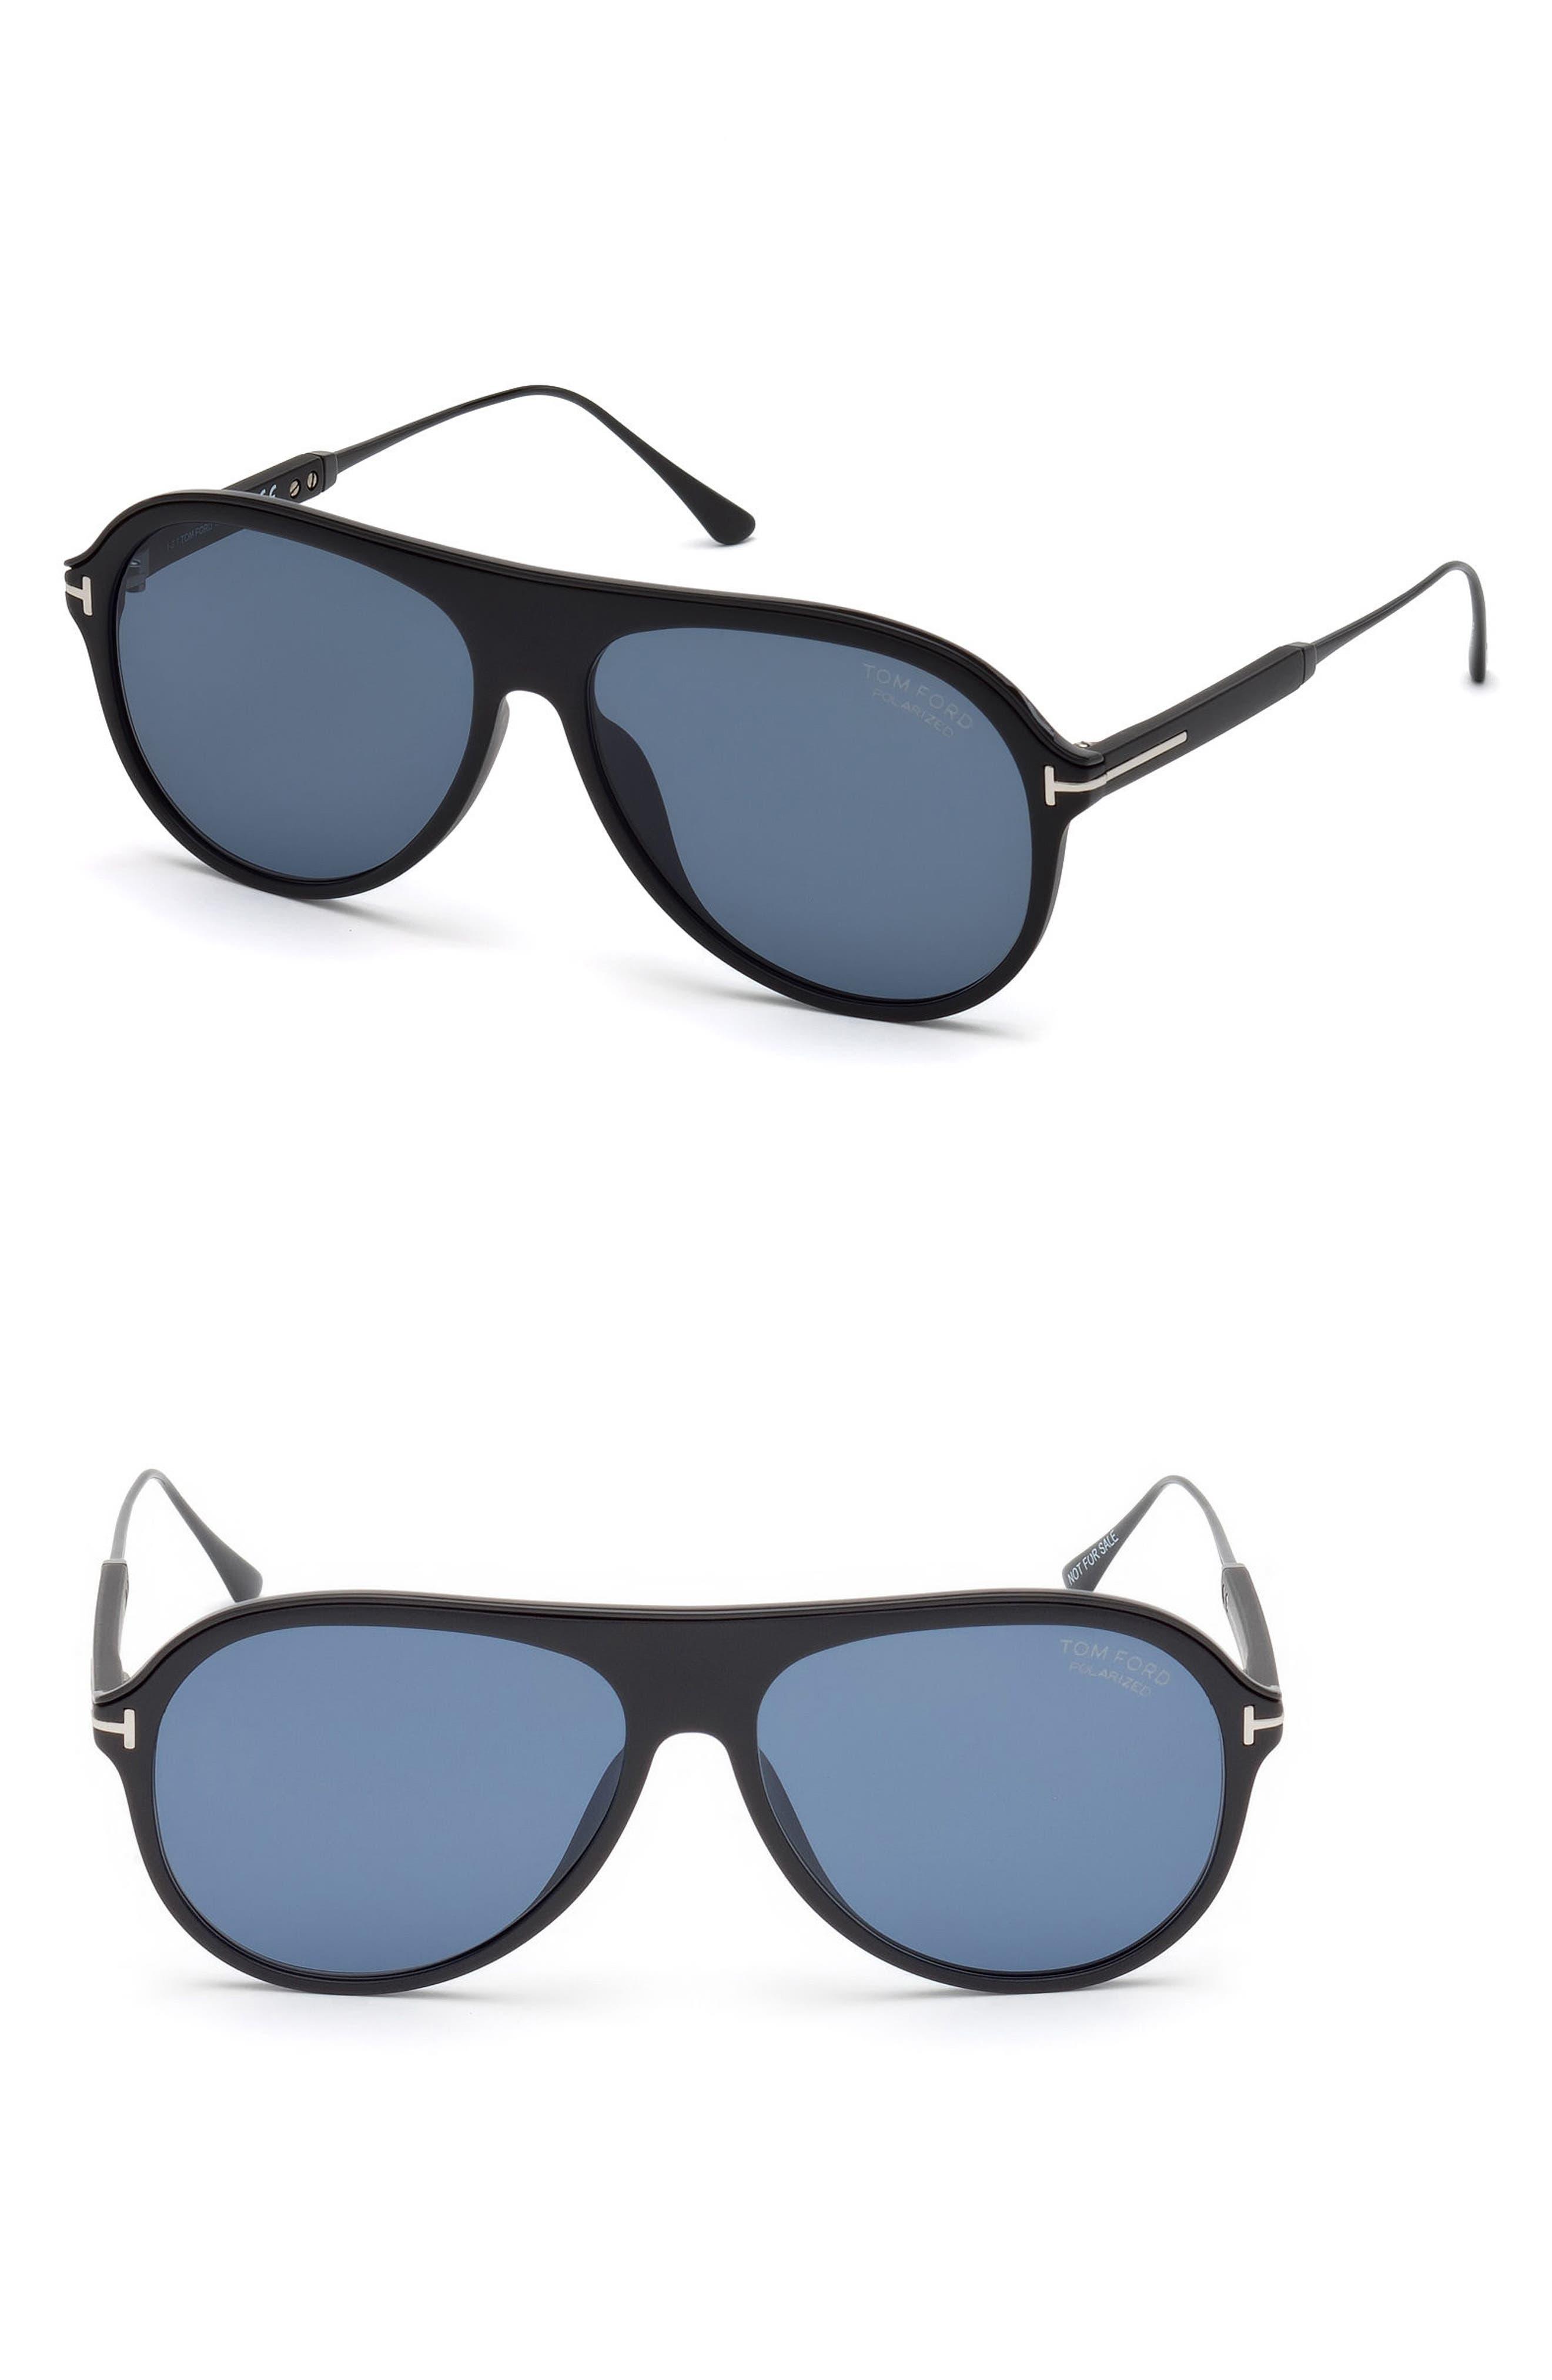 Nicholai-02 57mm Polarized Sunglasses,                         Main,                         color, Matte Black / Smoke Polarized